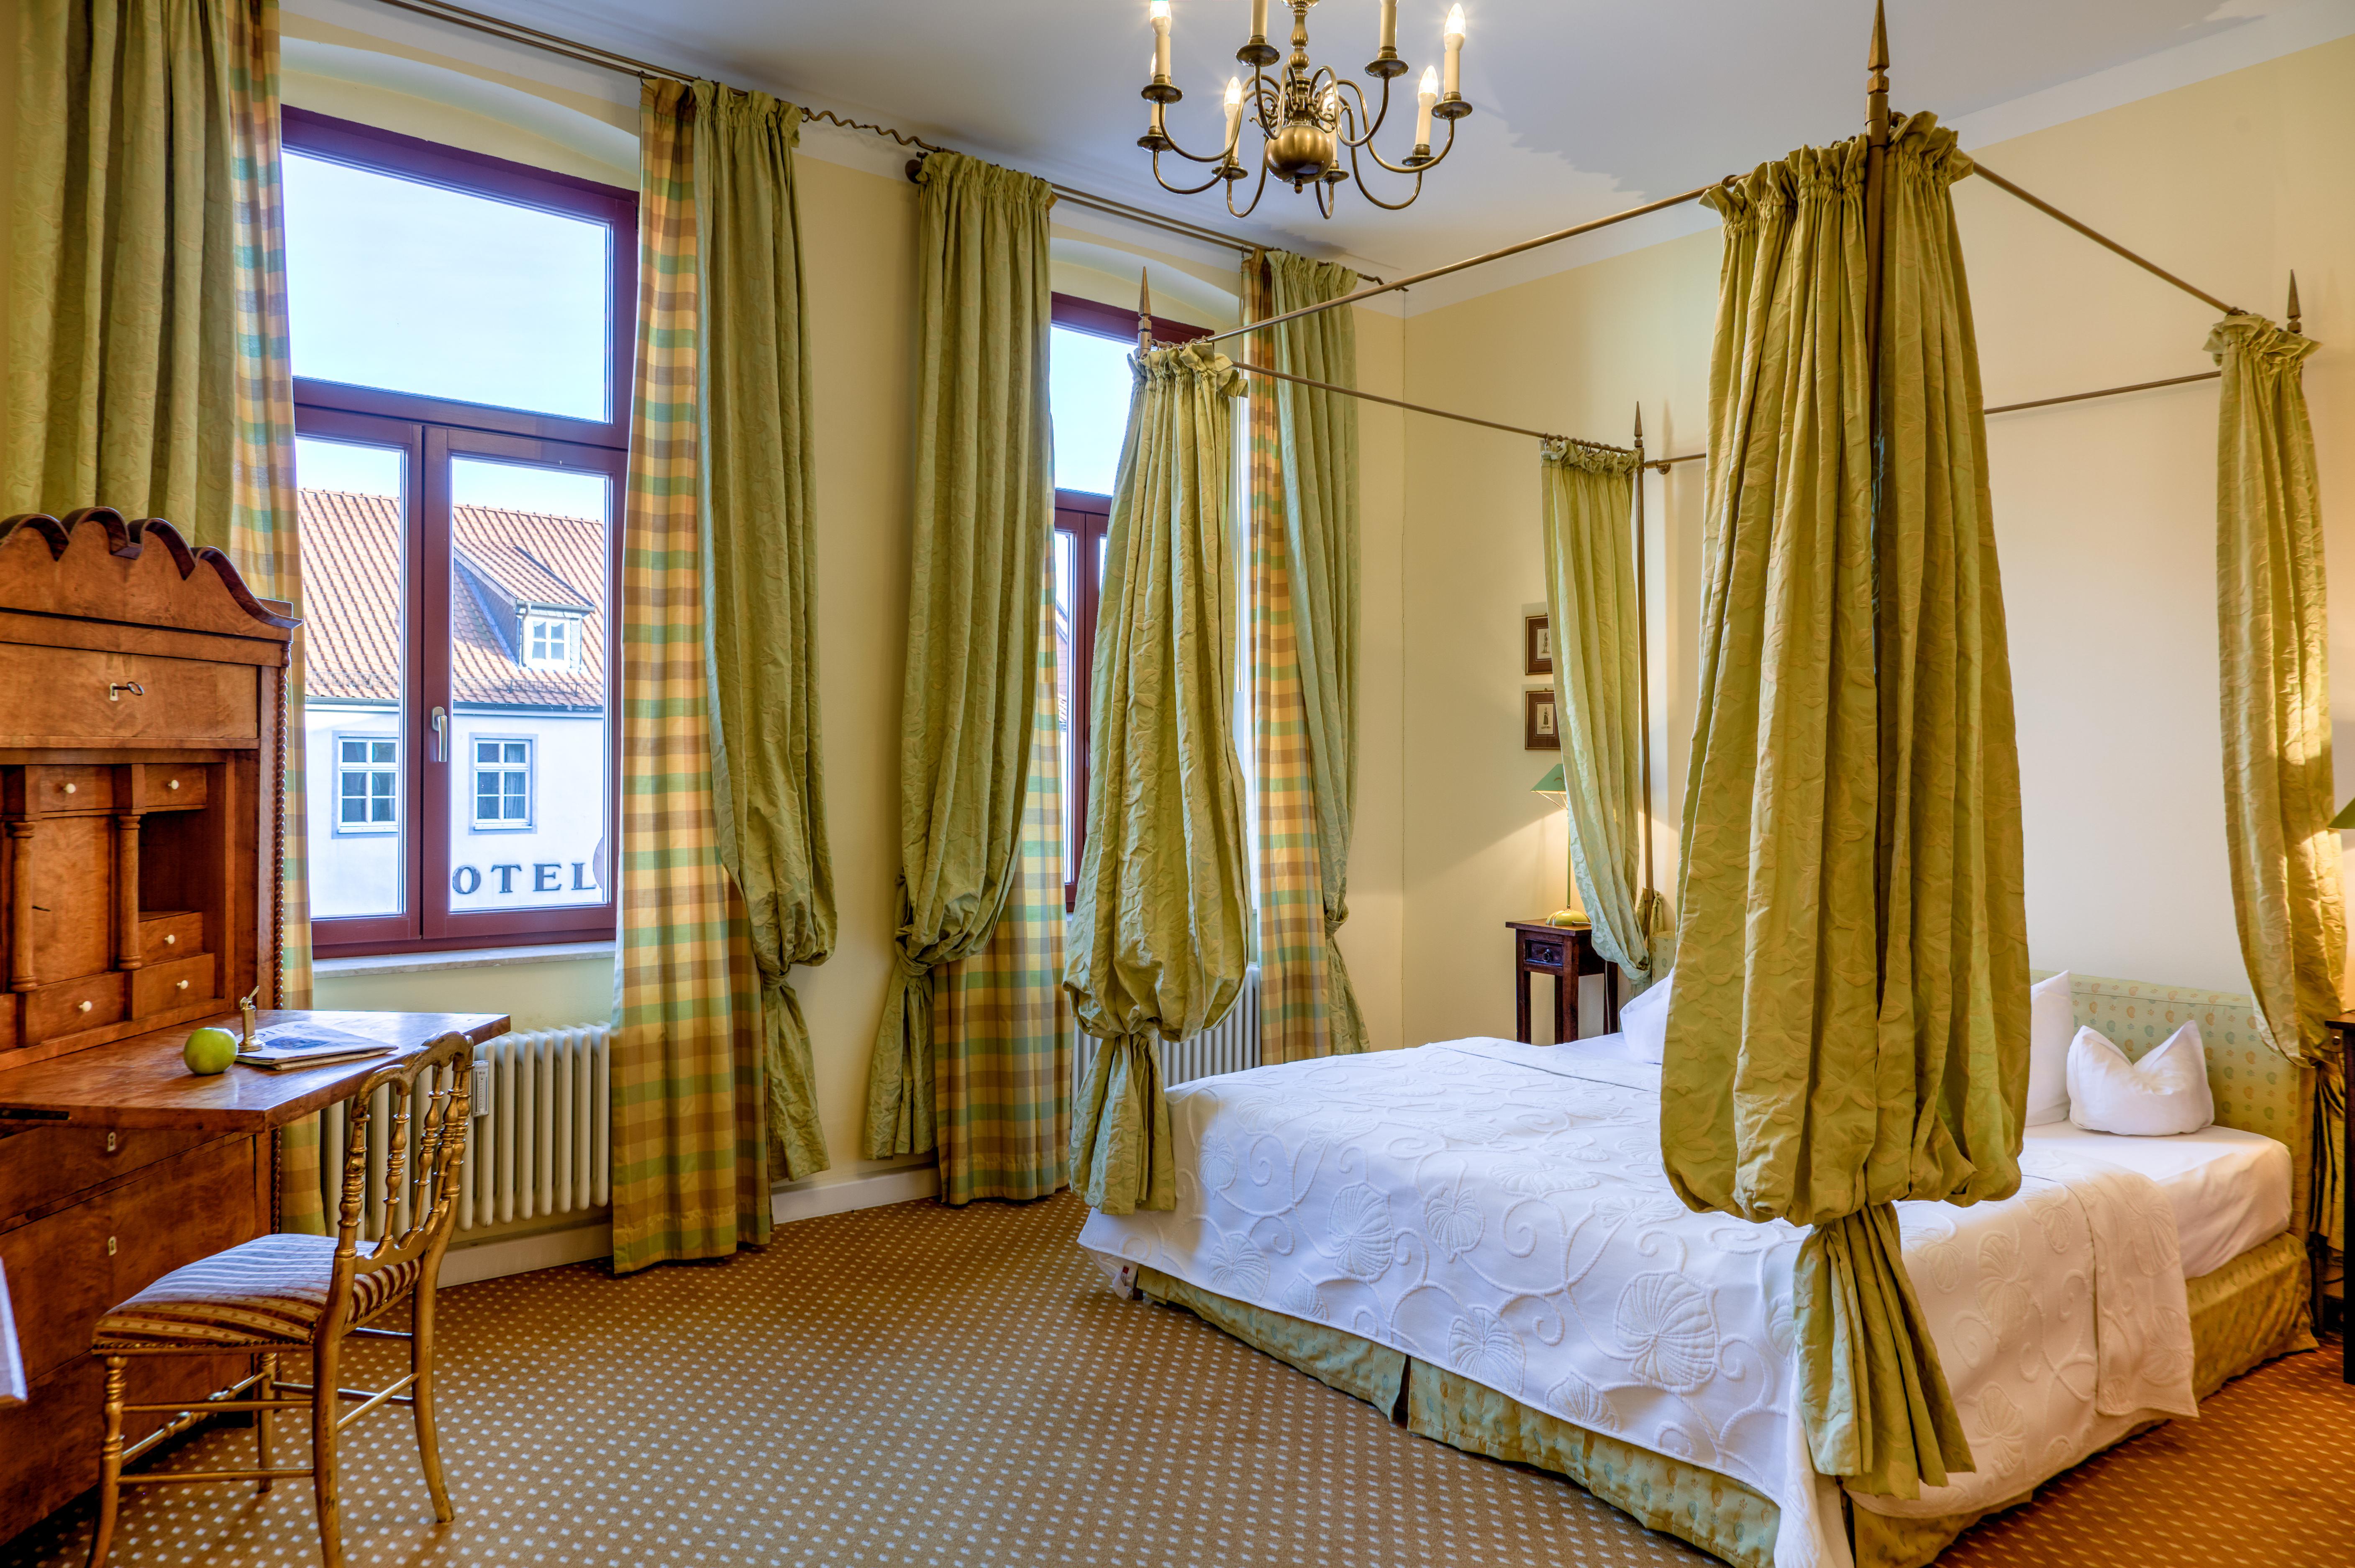 Hotel zum Bär in Quedlinburg - Doppelzimmer